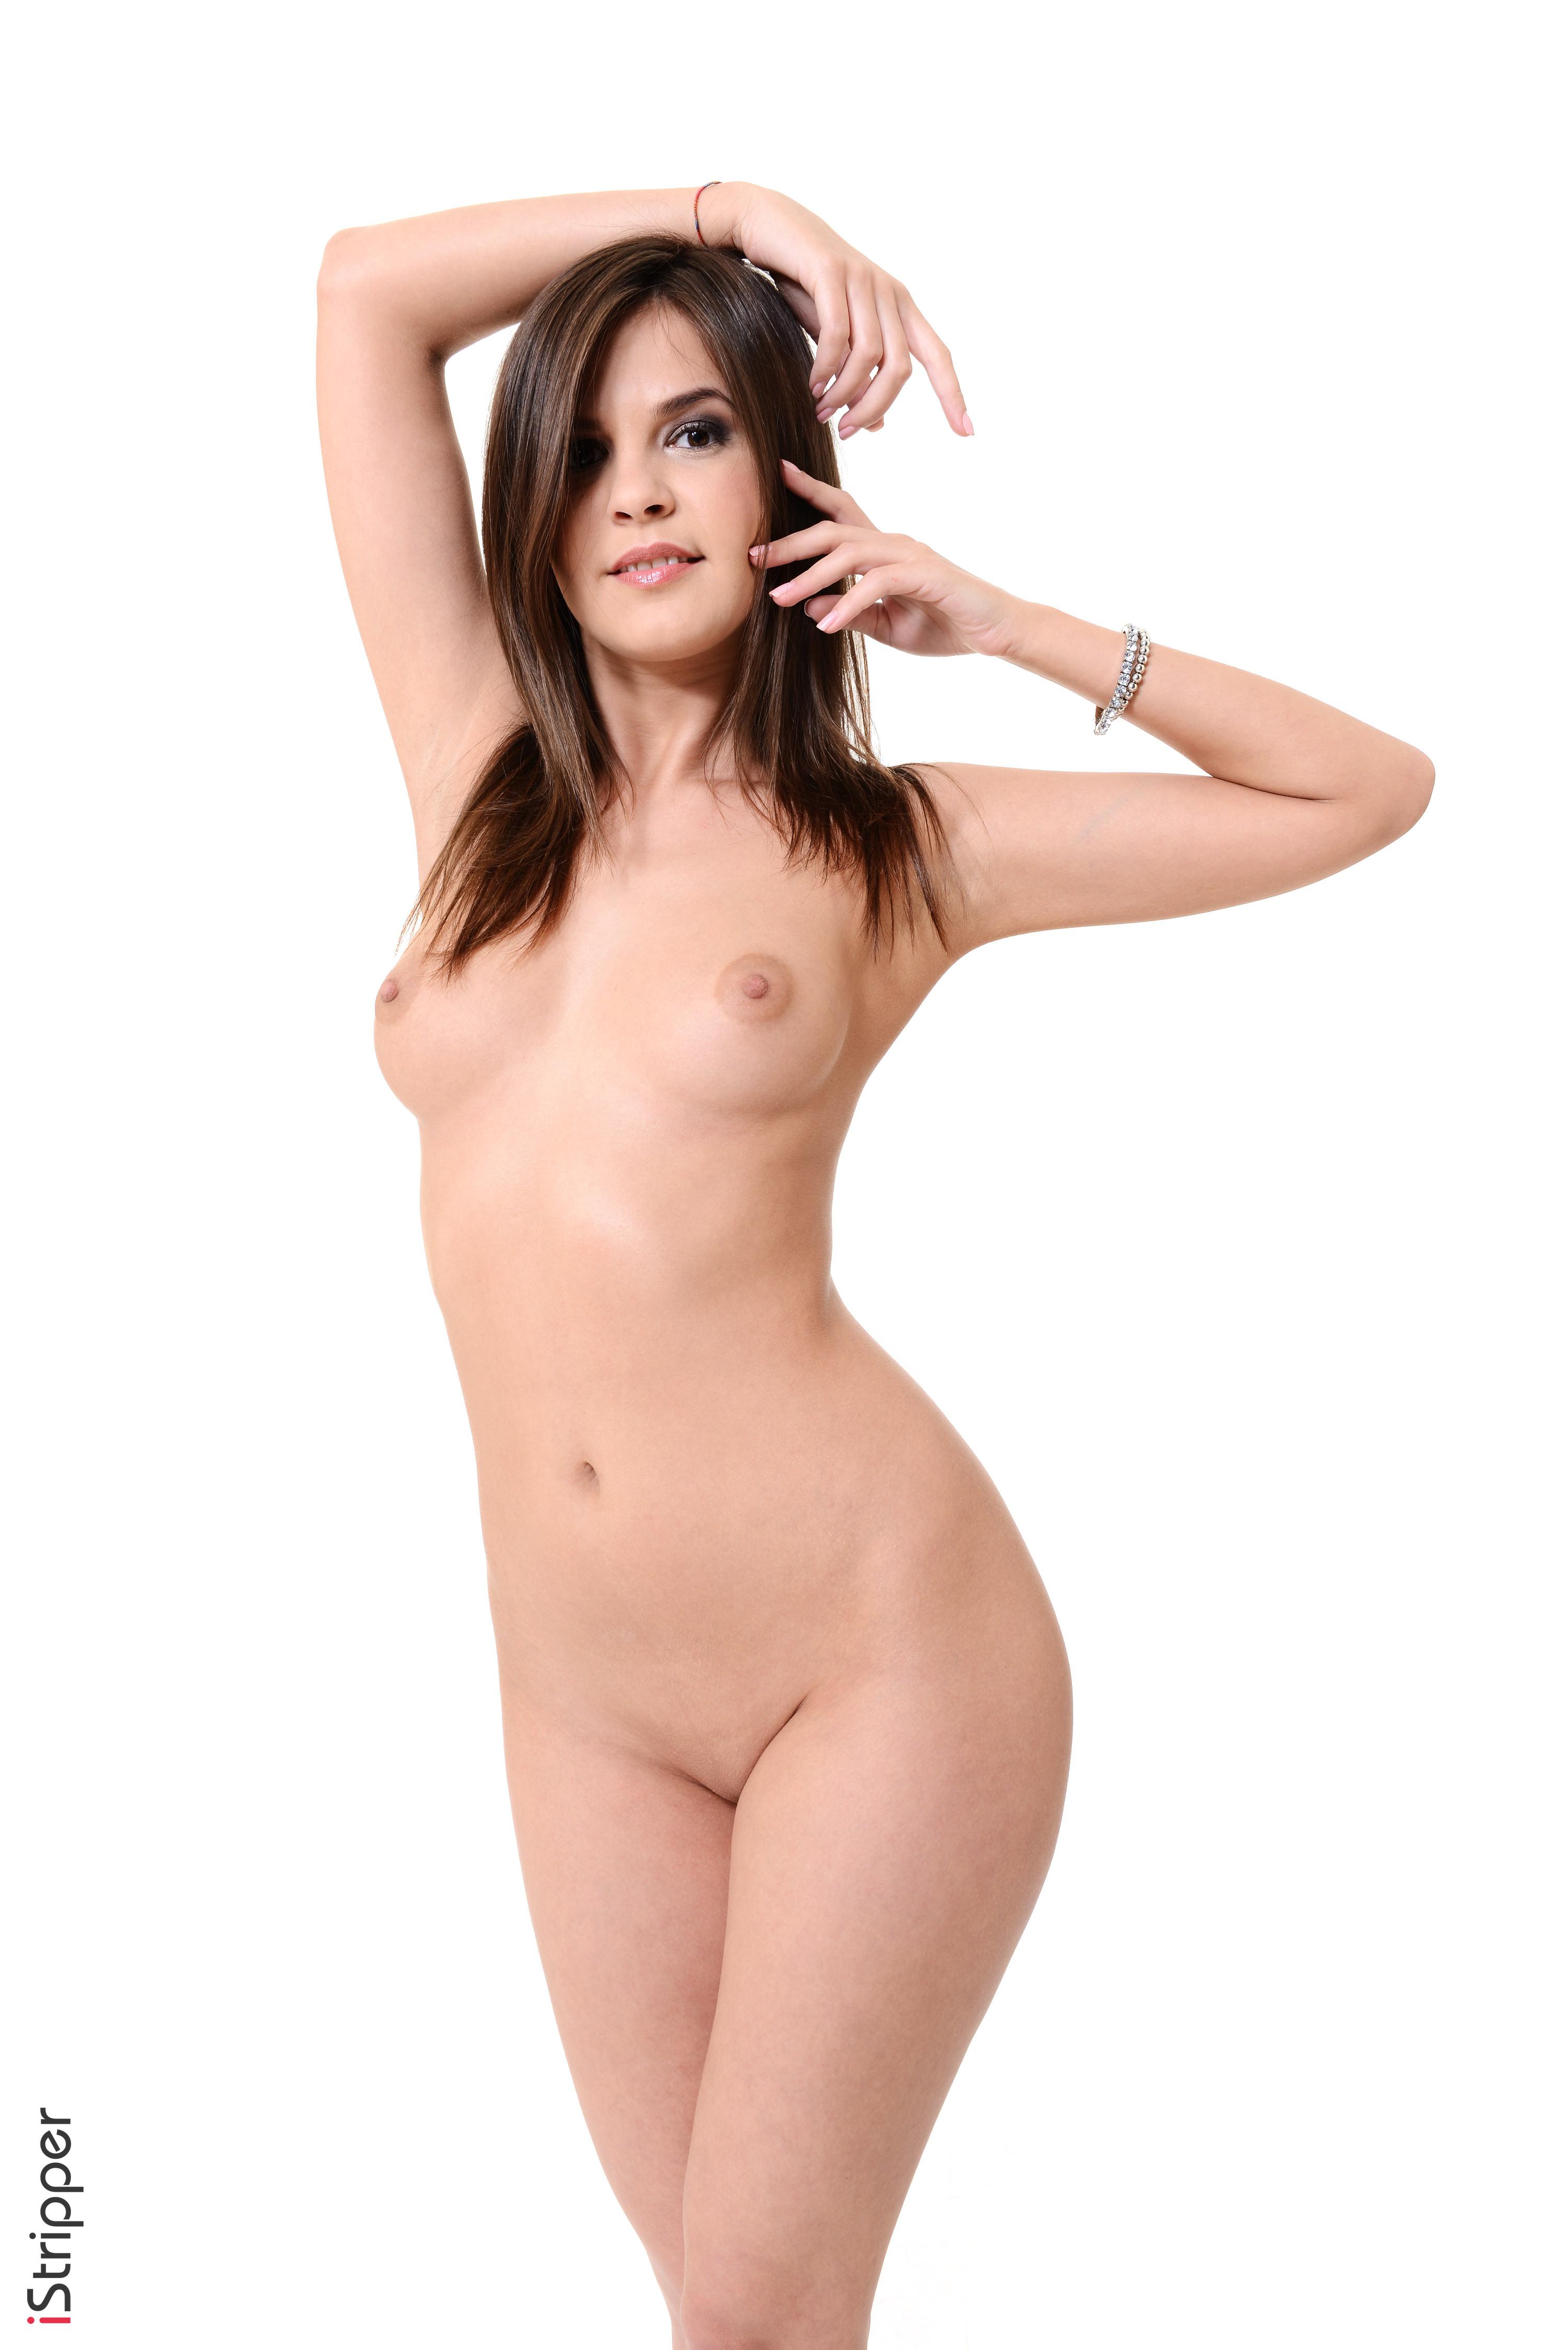 girl naked wallpapers